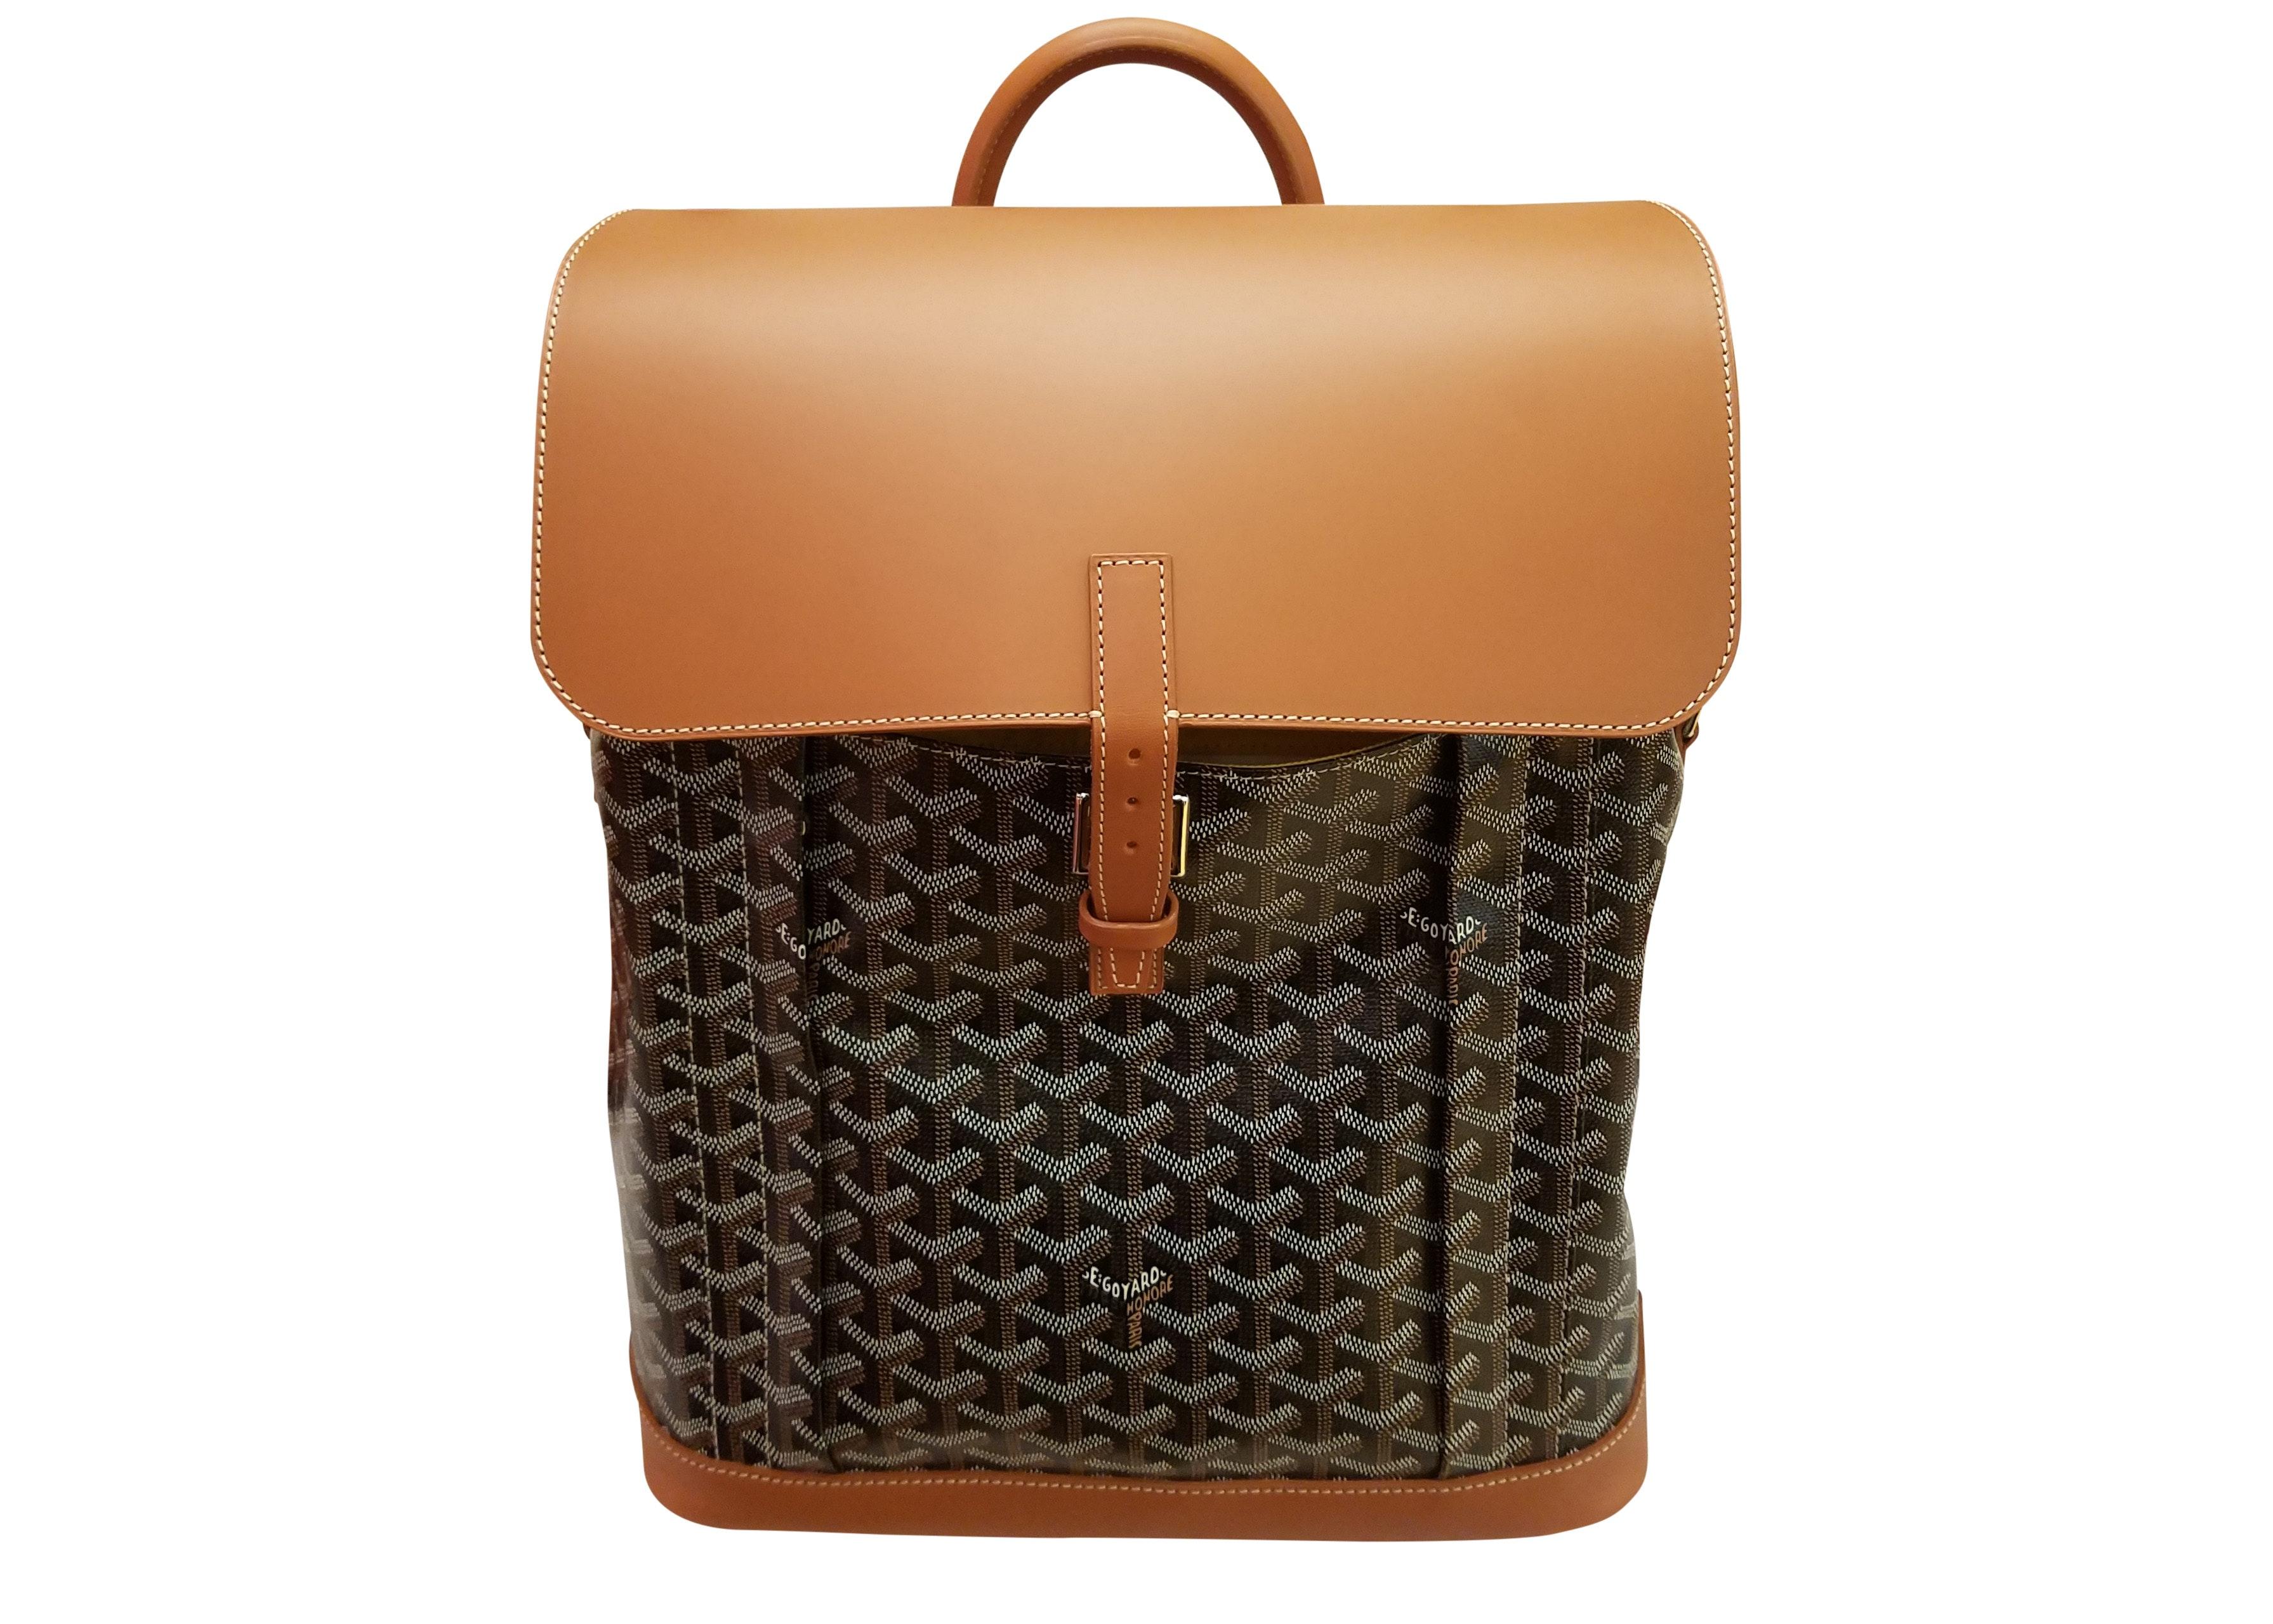 Goyard Alpin Backpack Black/Tan